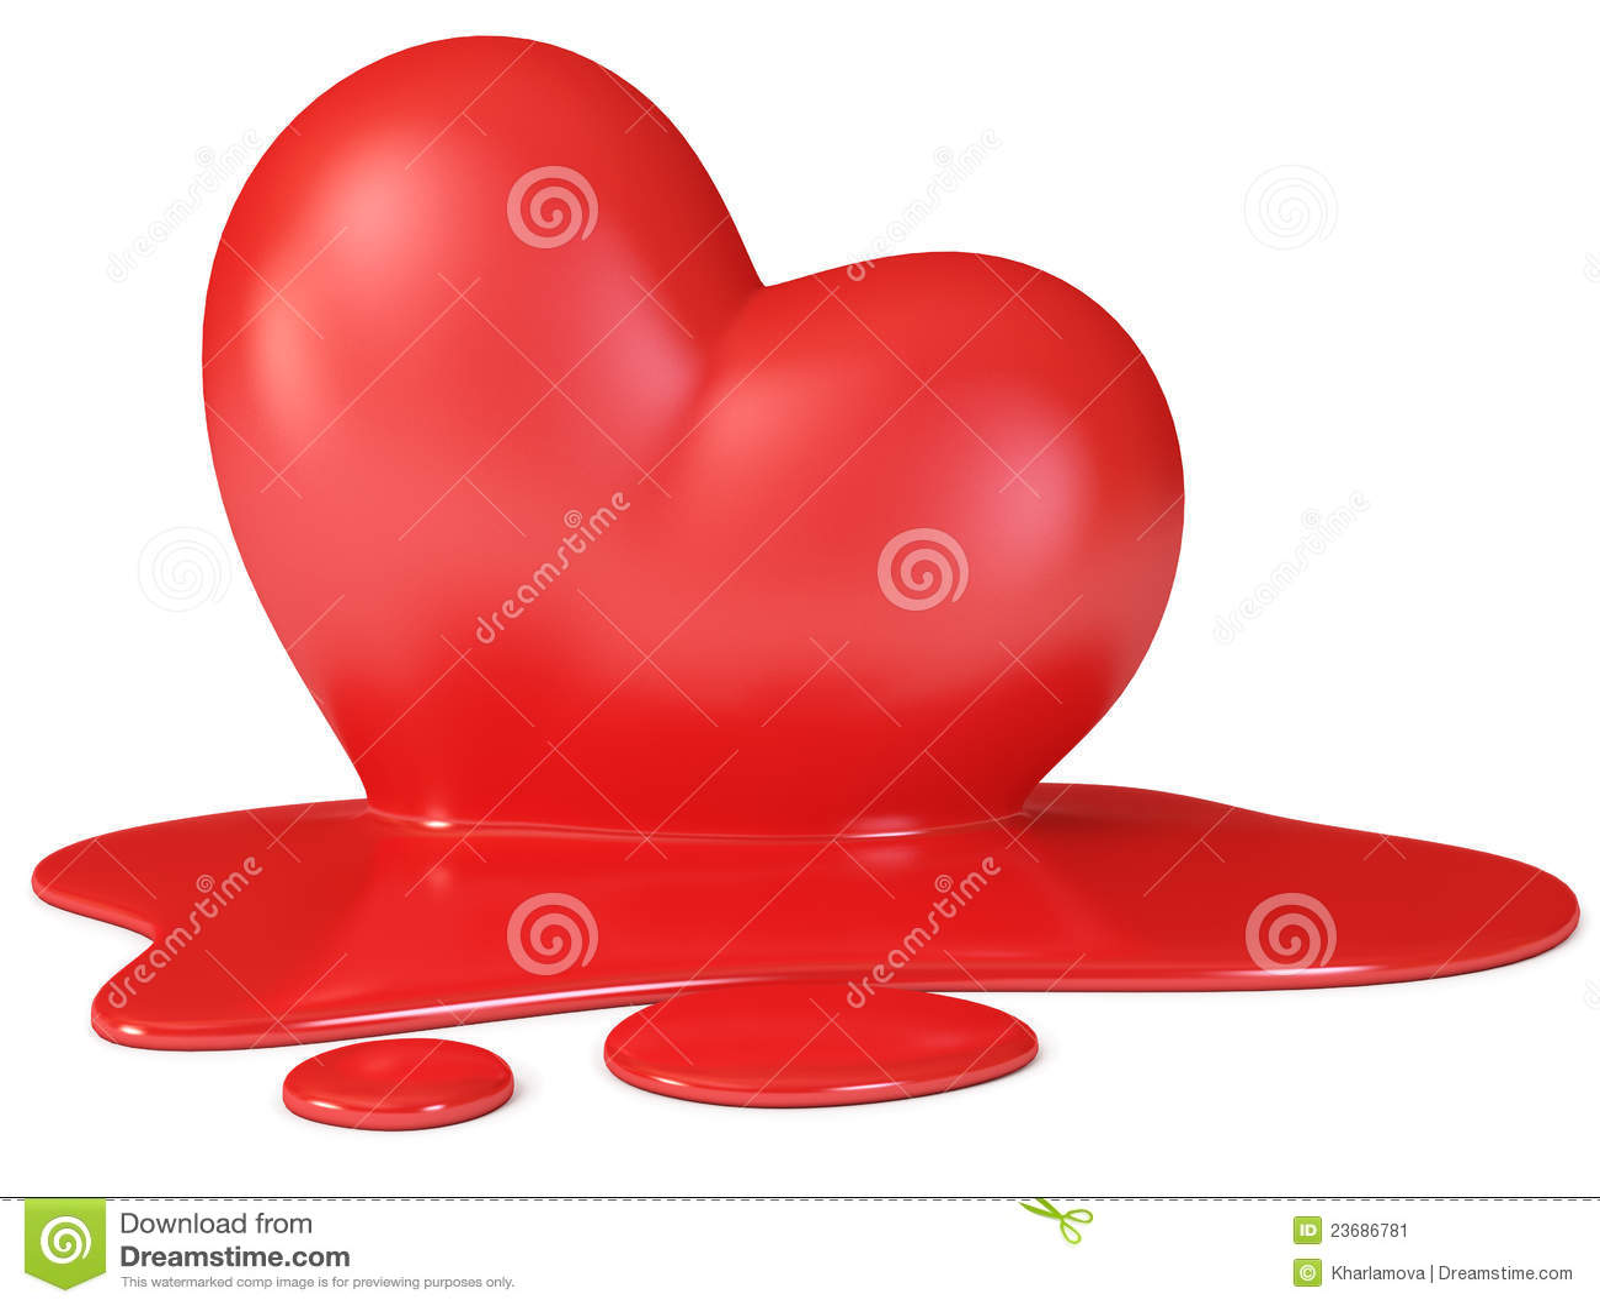 Red Melting Heart Stock Image - Image: 23686781